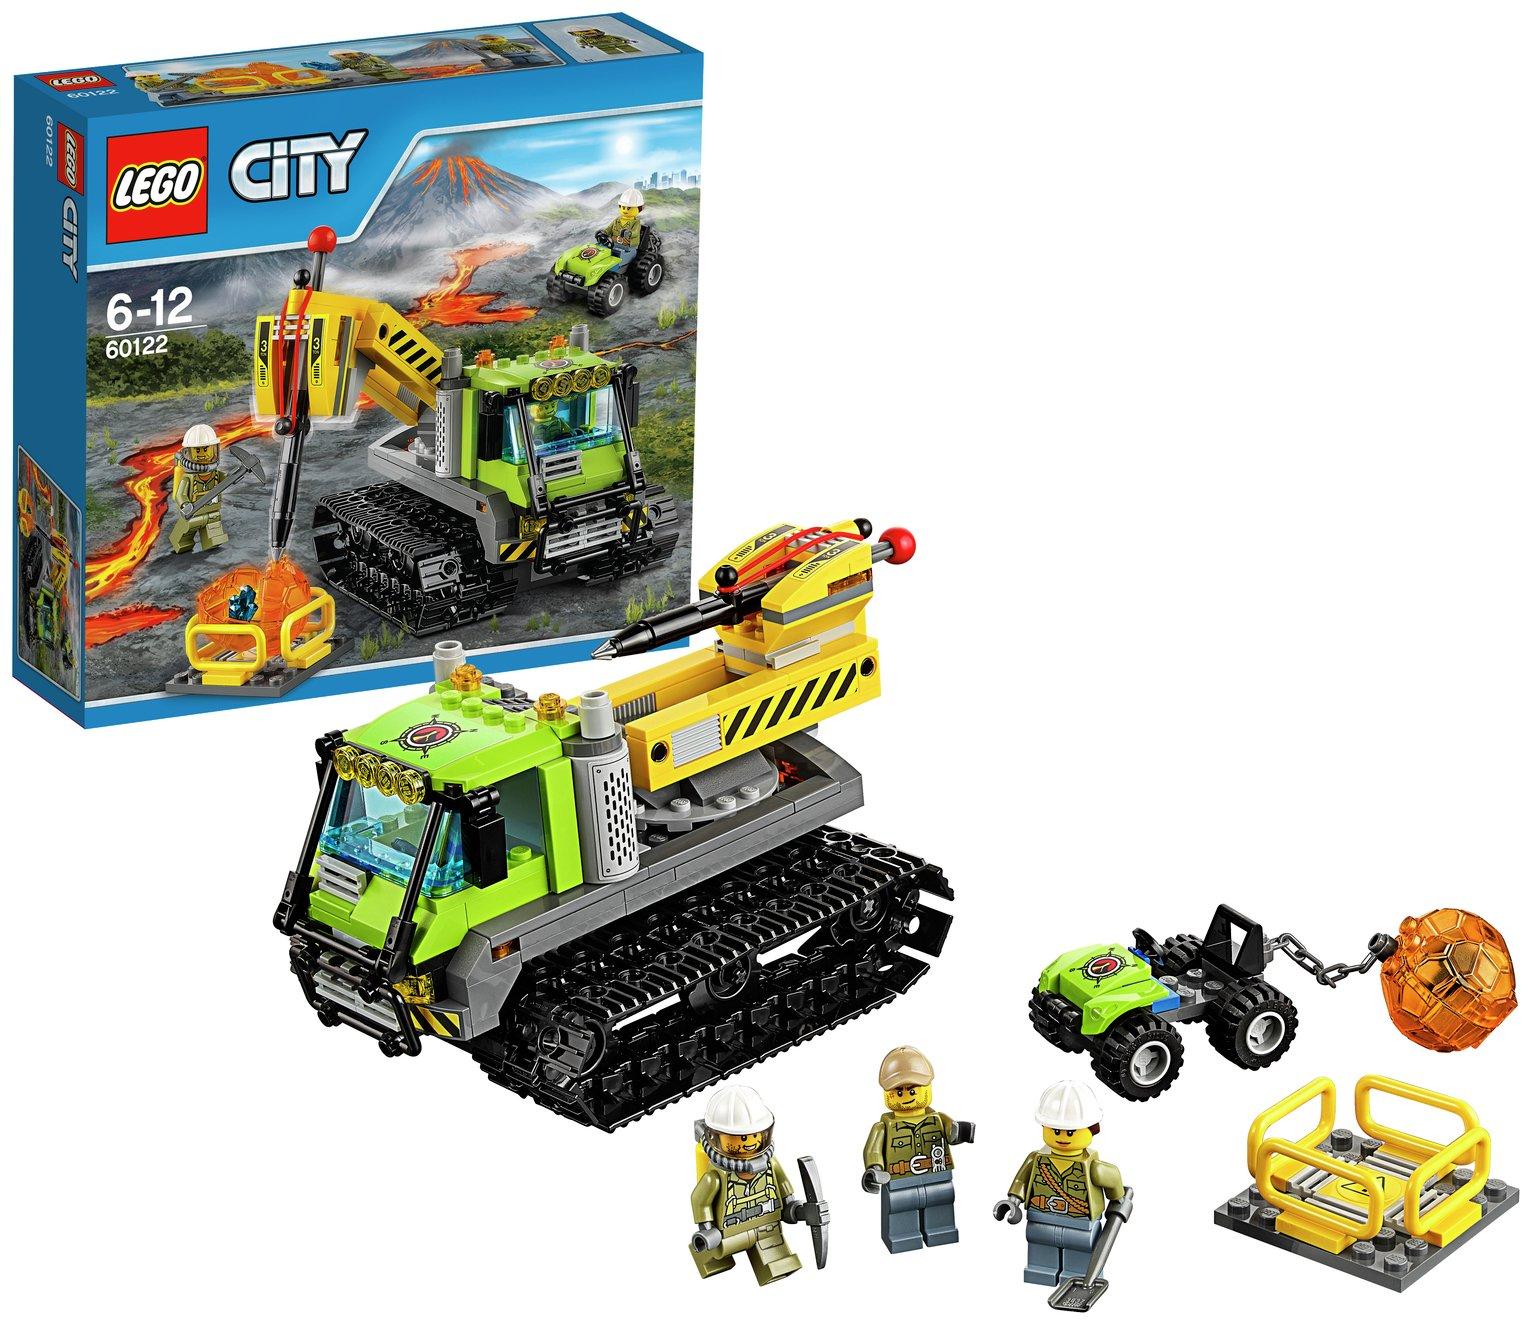 LEGO City Volcano Crawler - 60122.